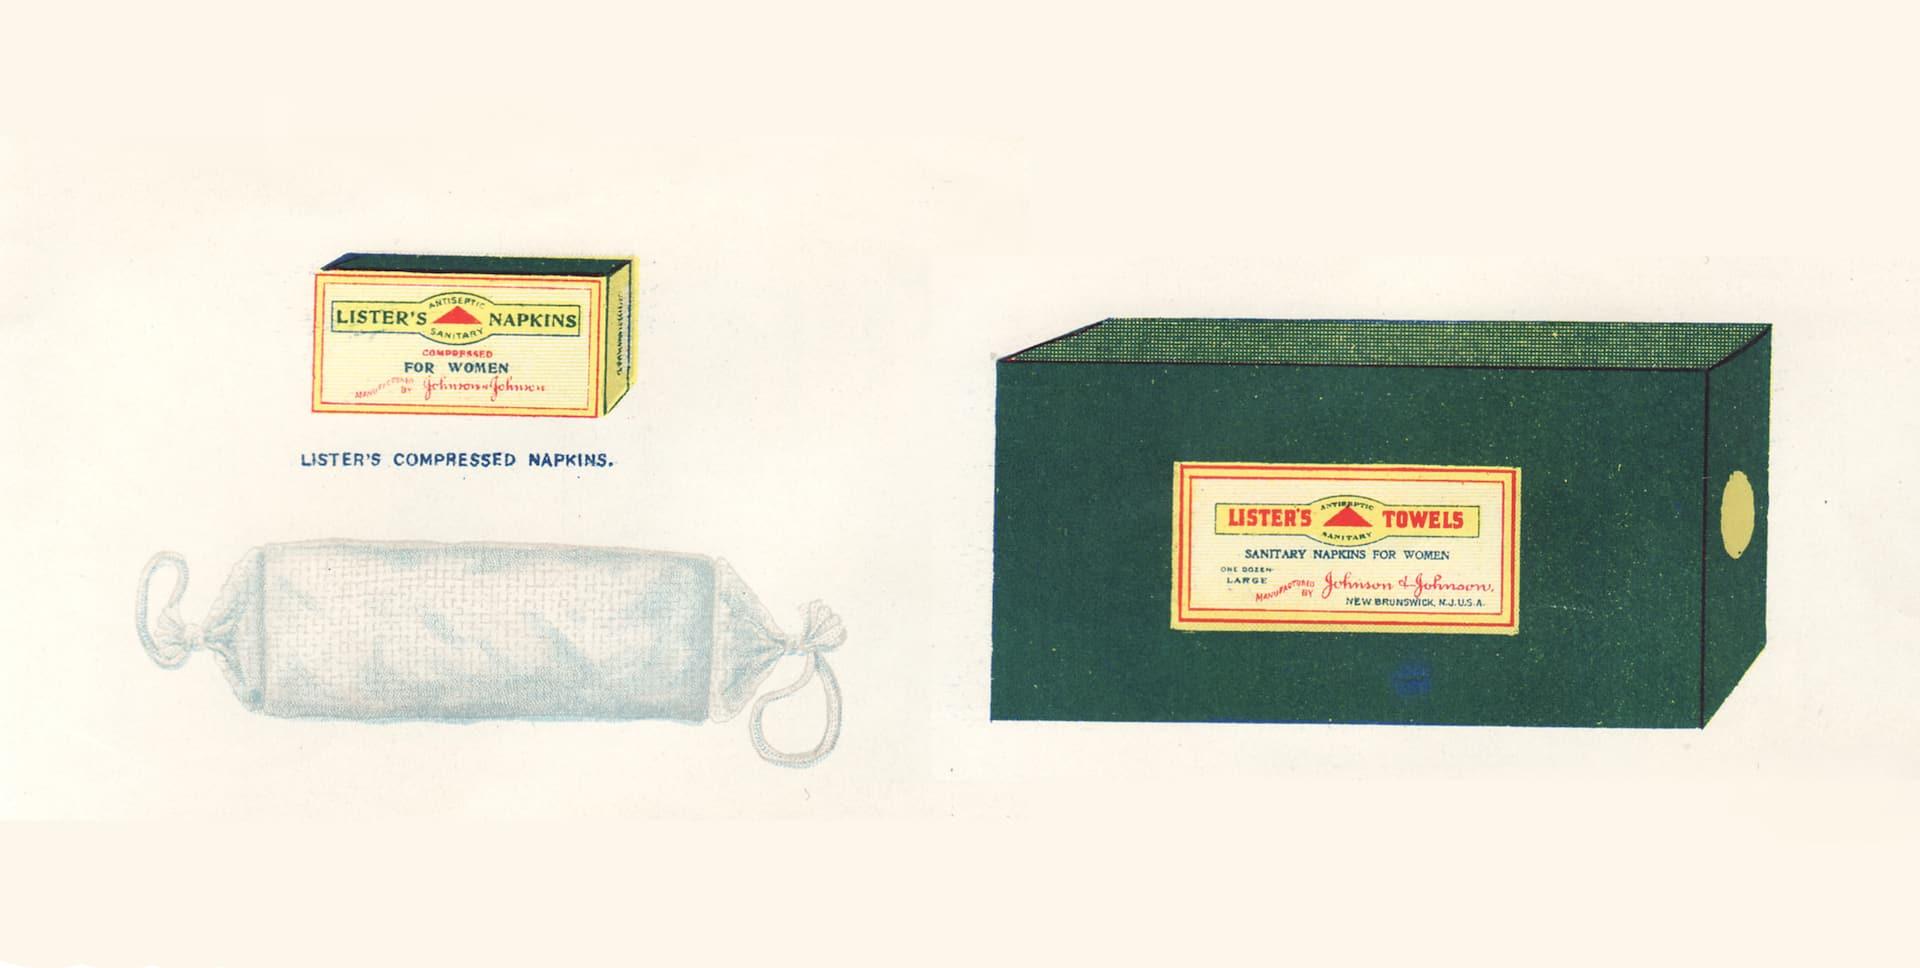 ancient, period pad, period, tool, 生理期, 月經, 古代衛生棉, 天然衛生棉, 女人經期